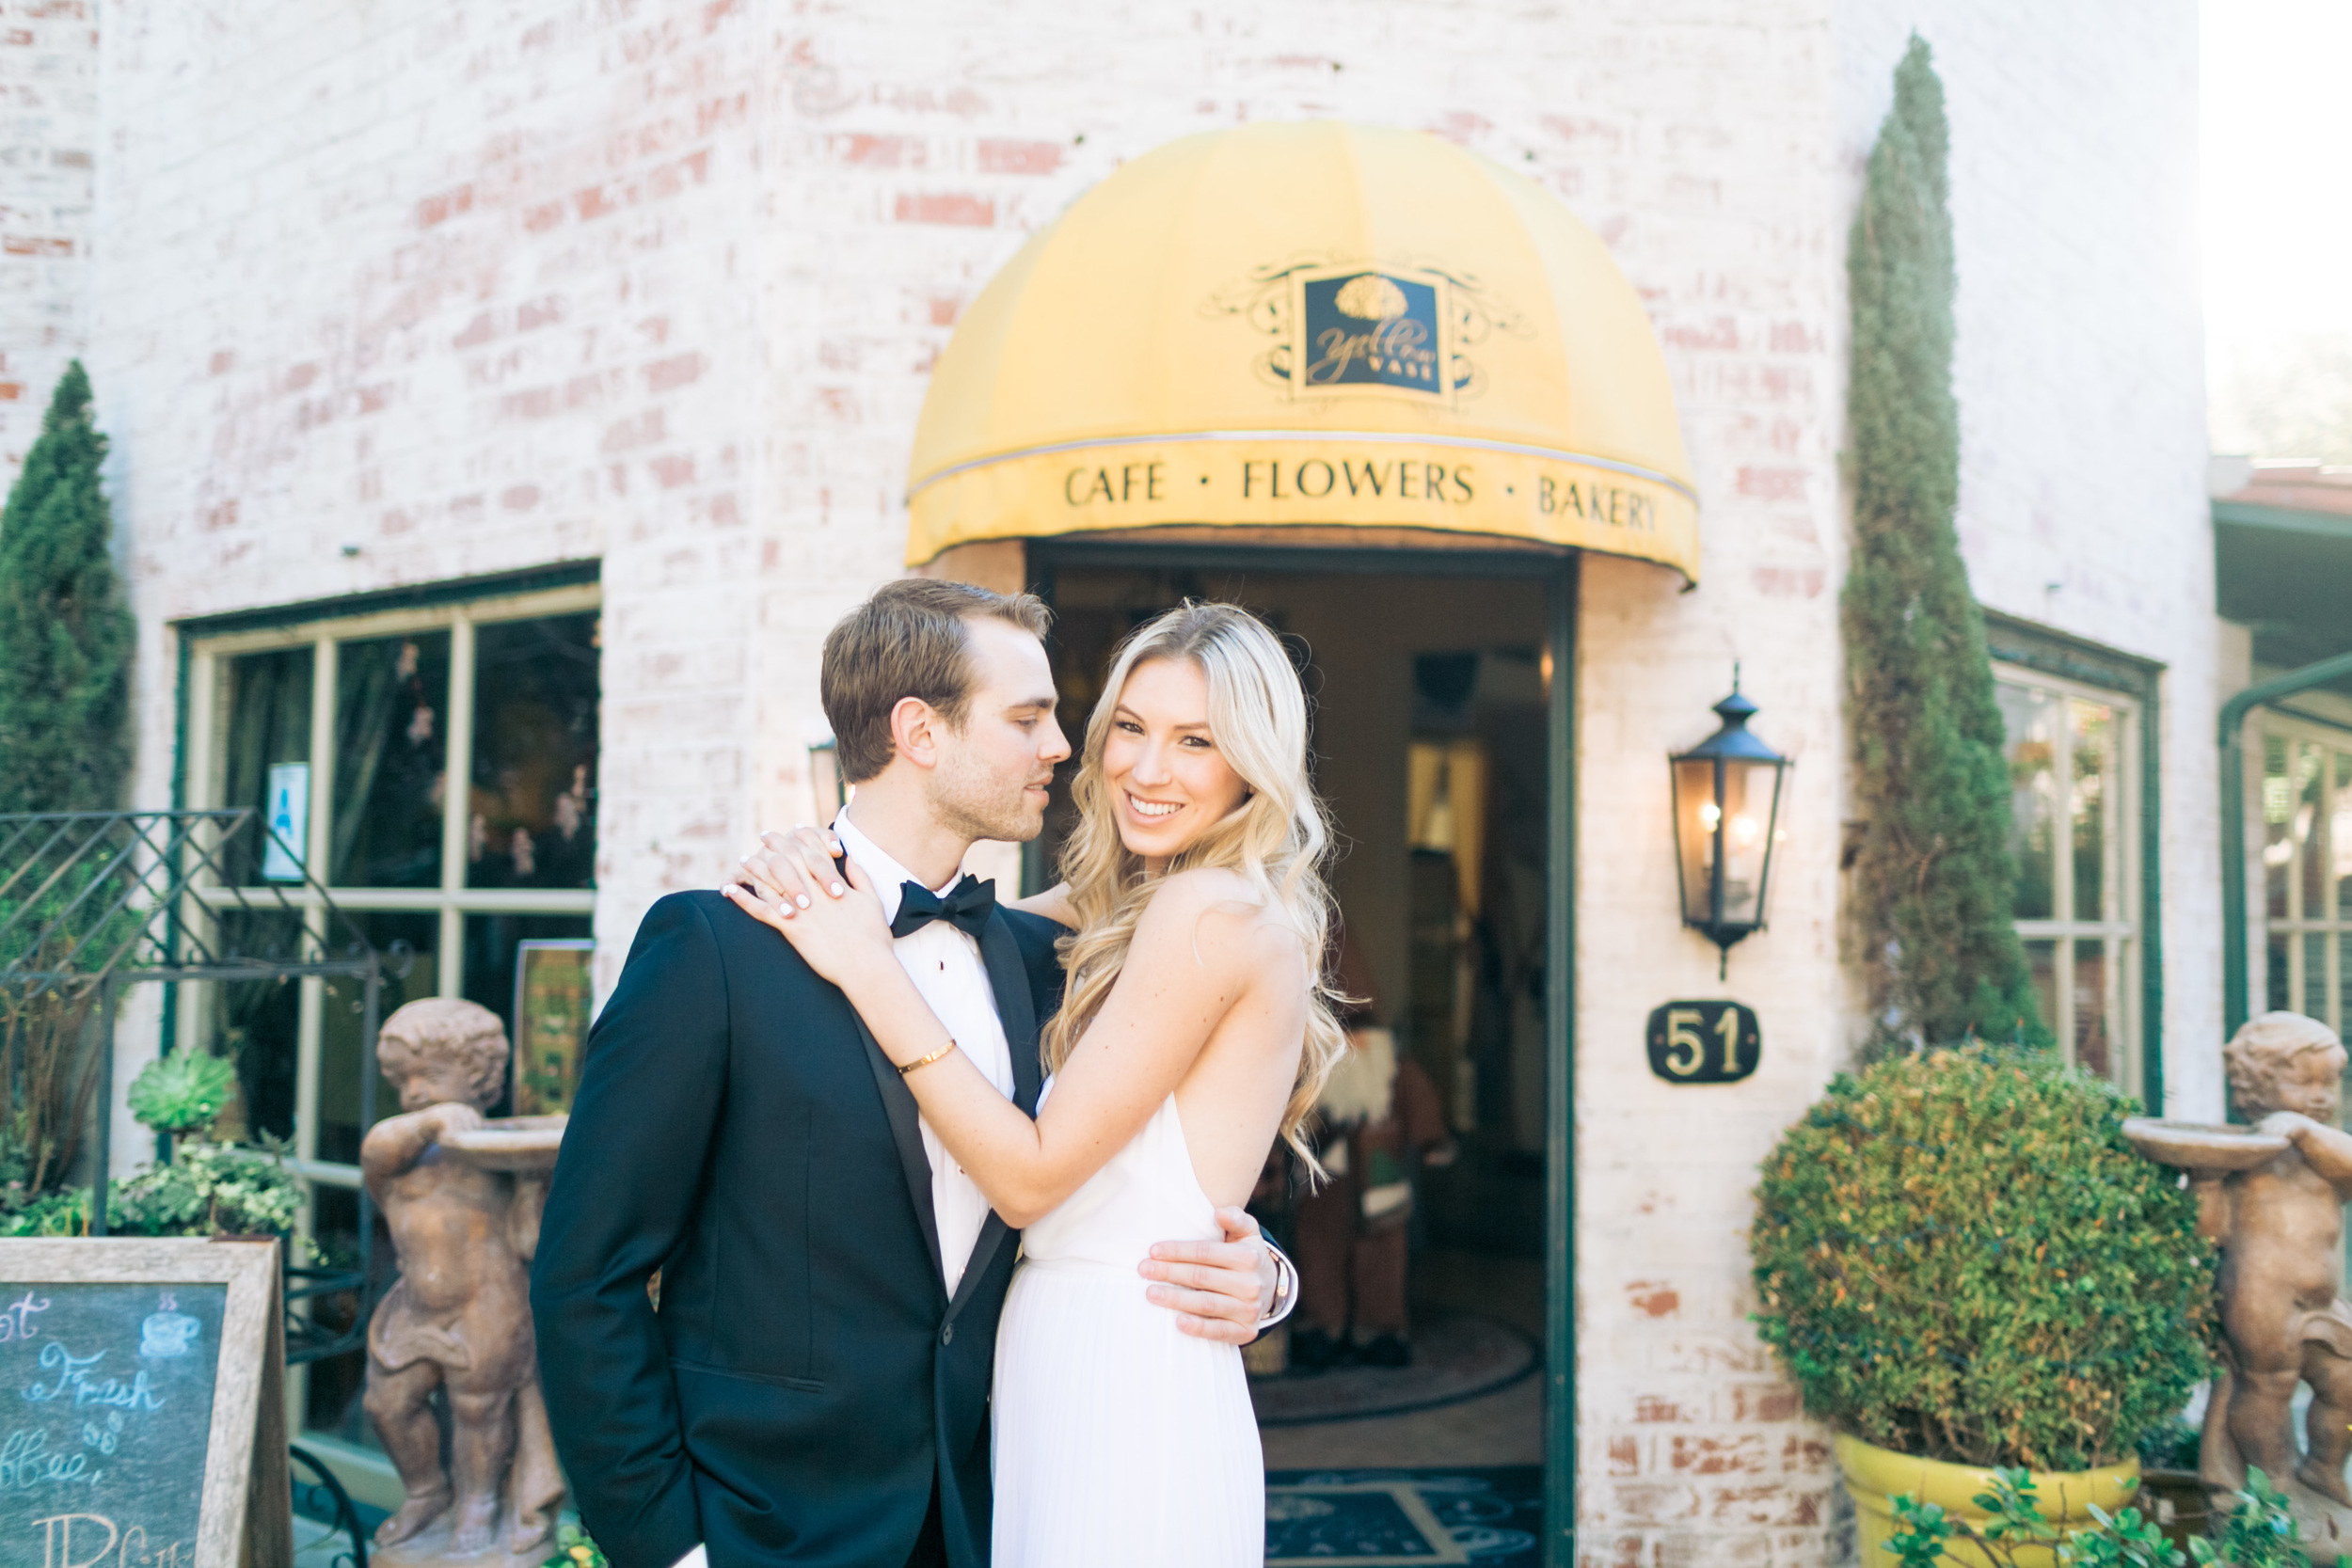 2015Natalie Schutt Photography- Palos Verdes Wedding-26.JPG